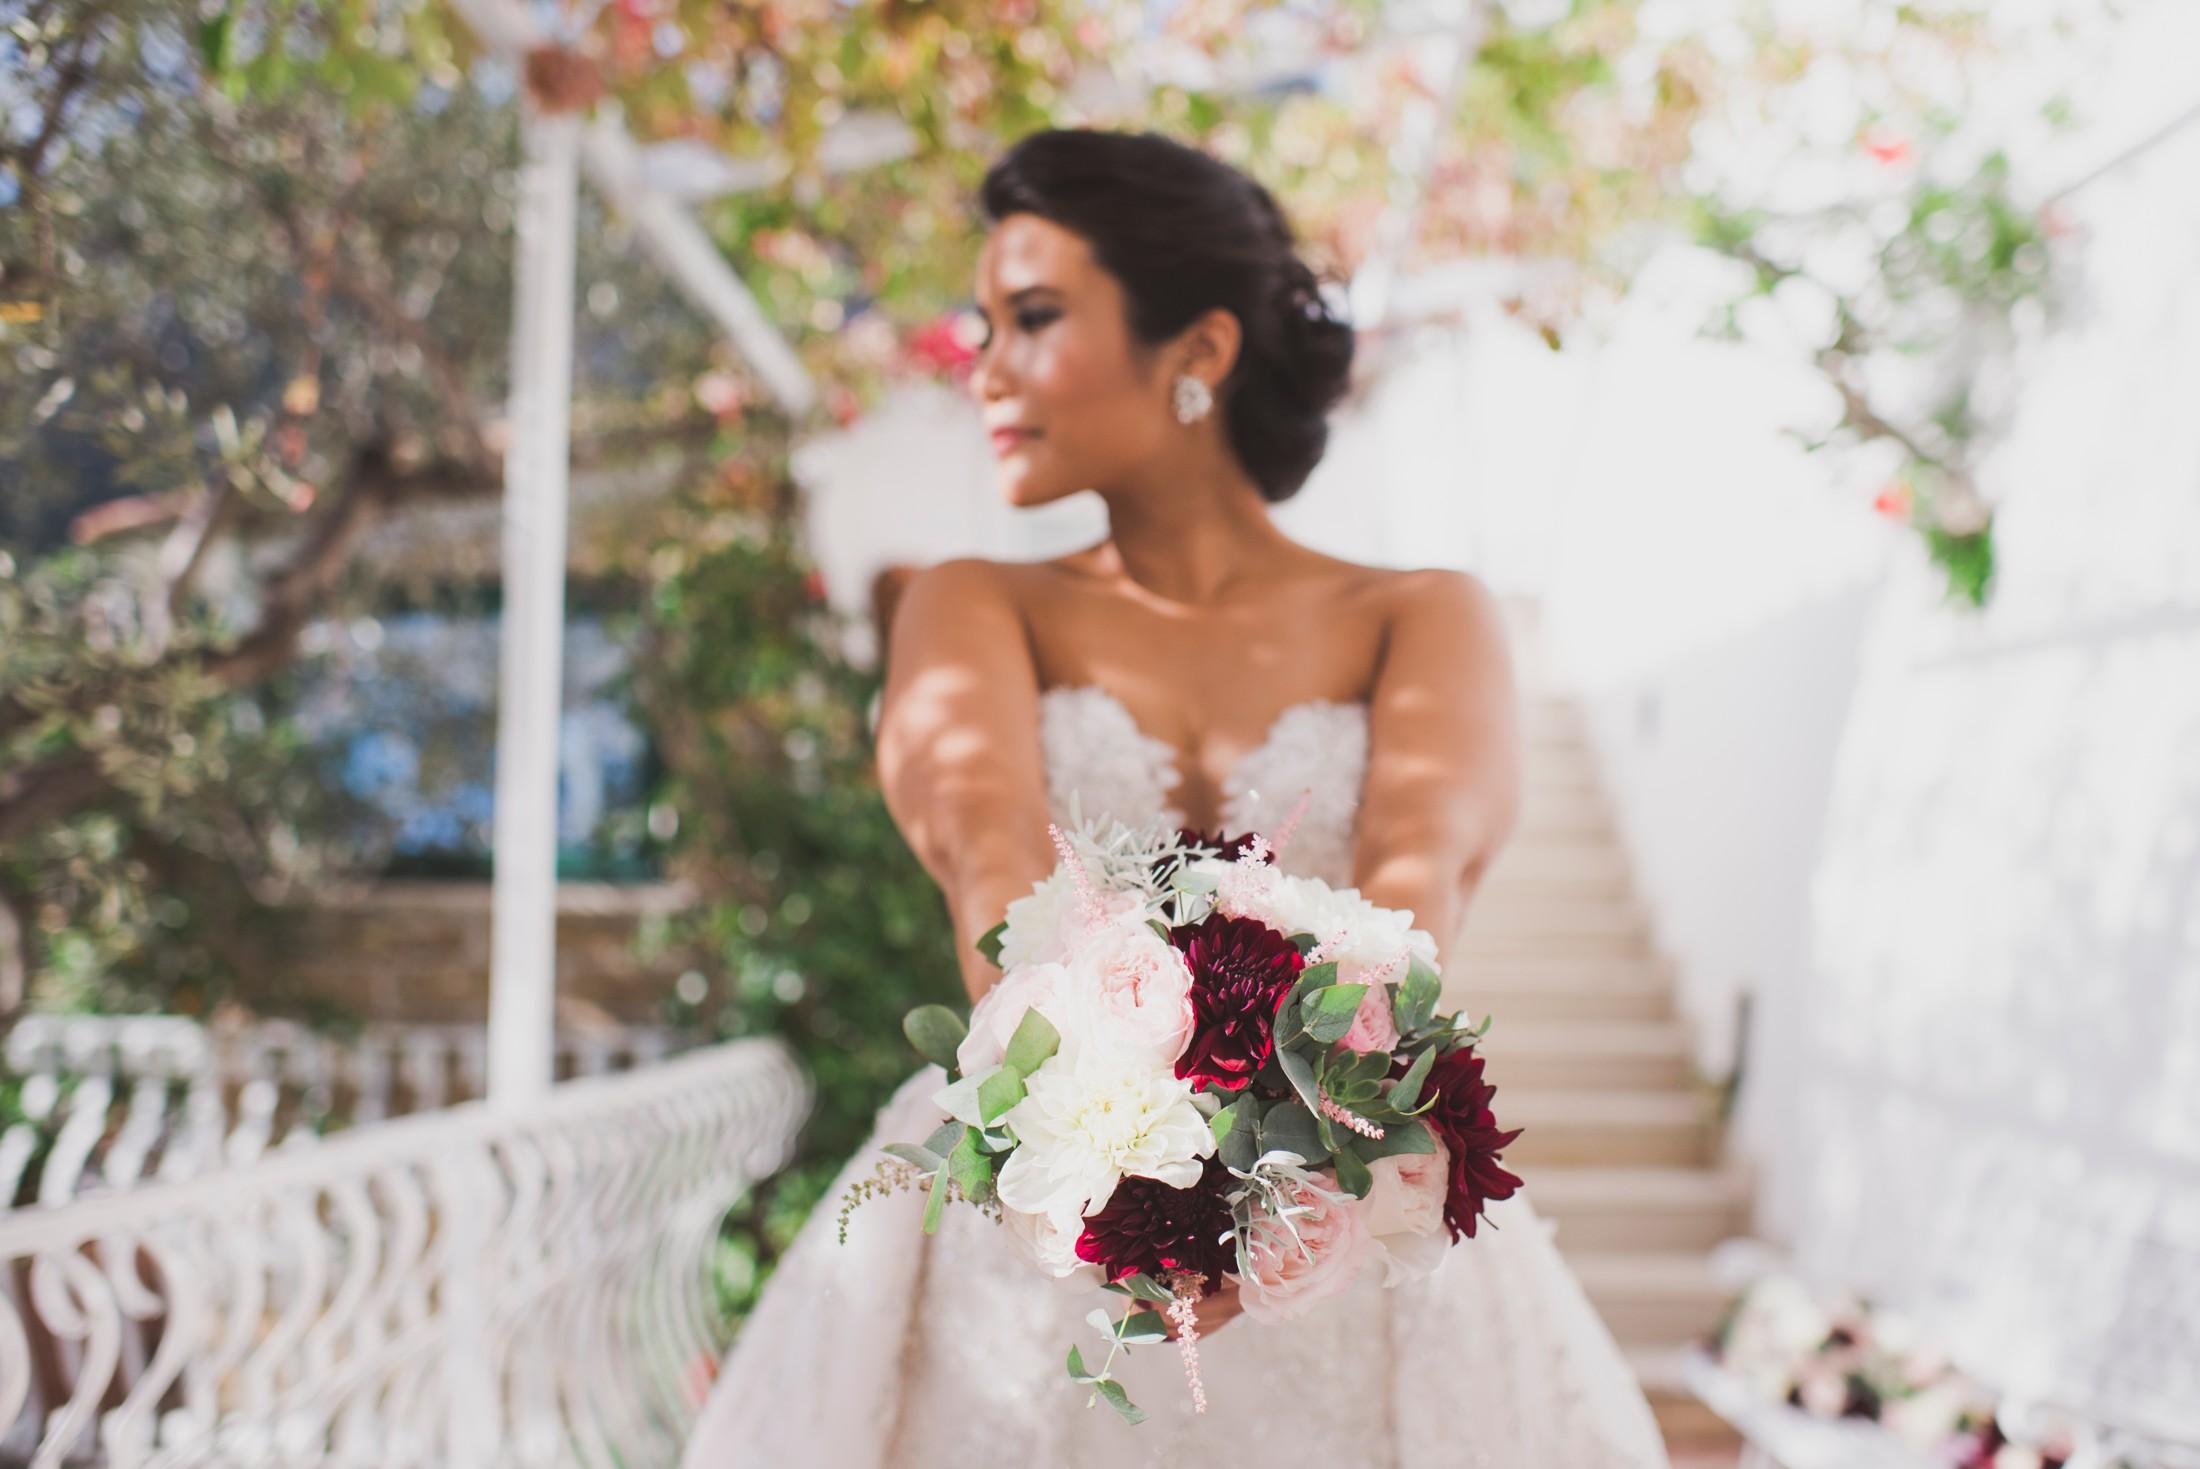 positano wedding bride's portrait with her bouquet